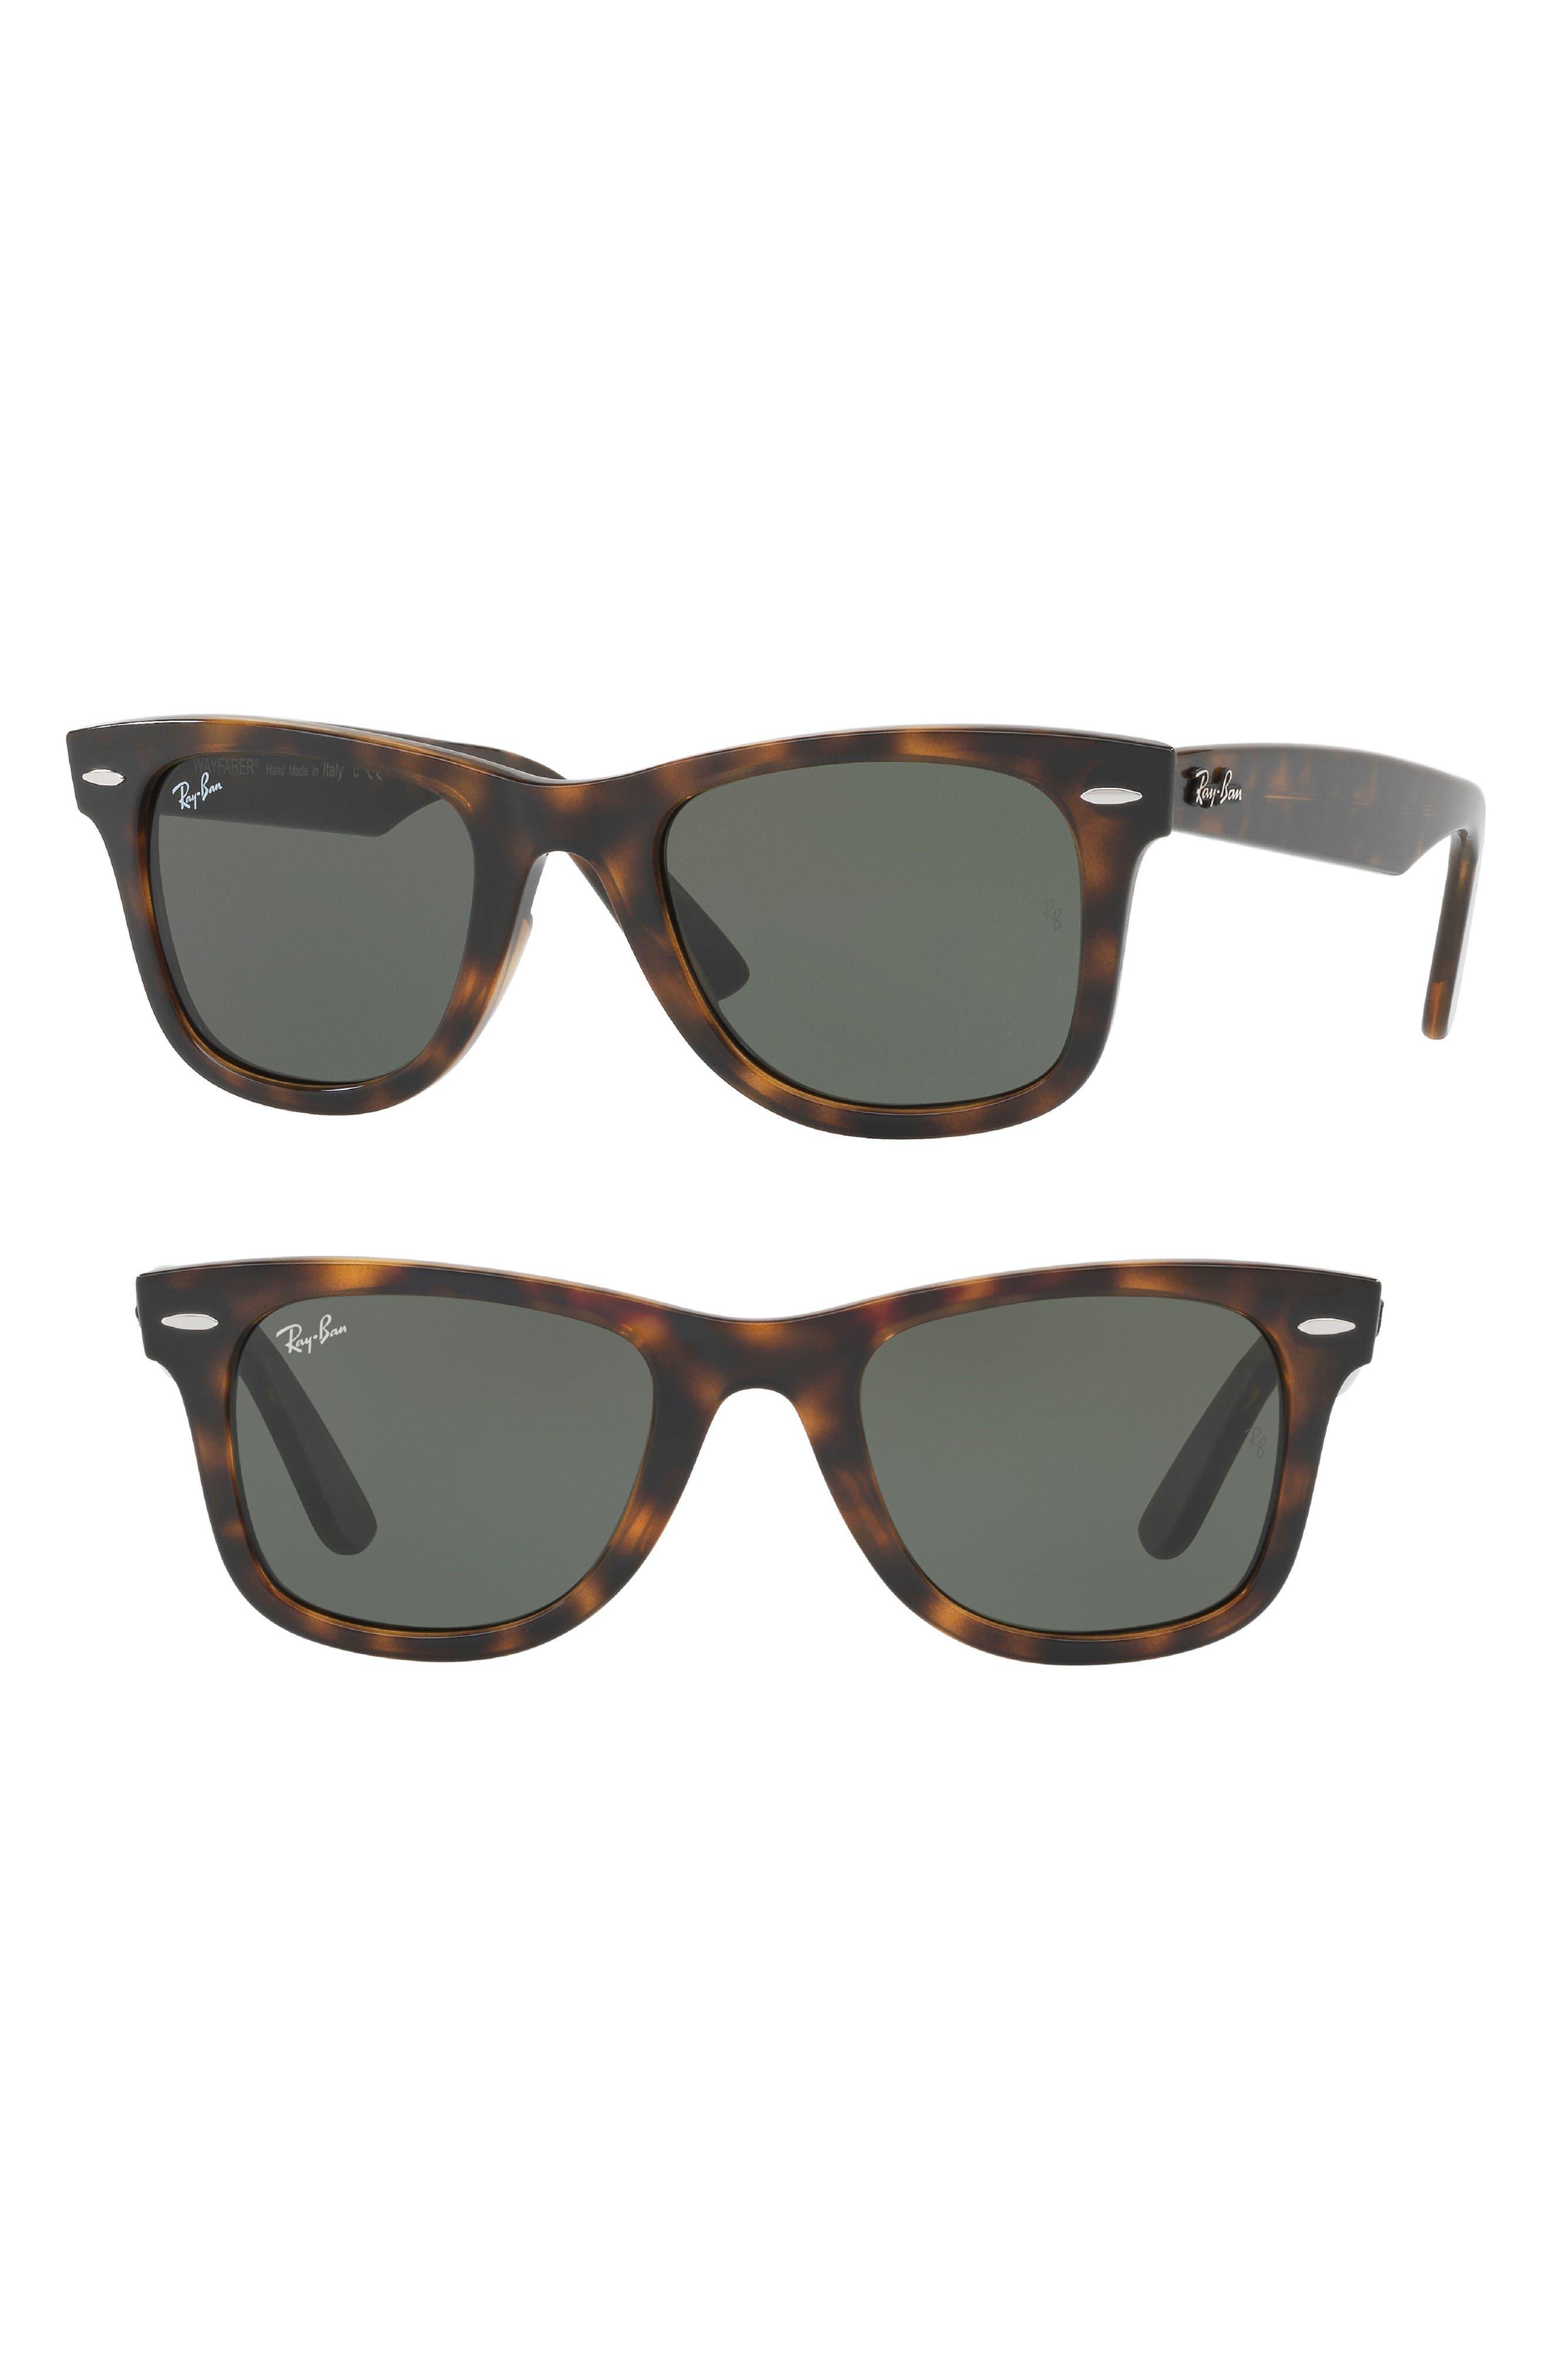 Wayfarer Ease 50mm Sunglasses,                         Main,                         color, Light Havana